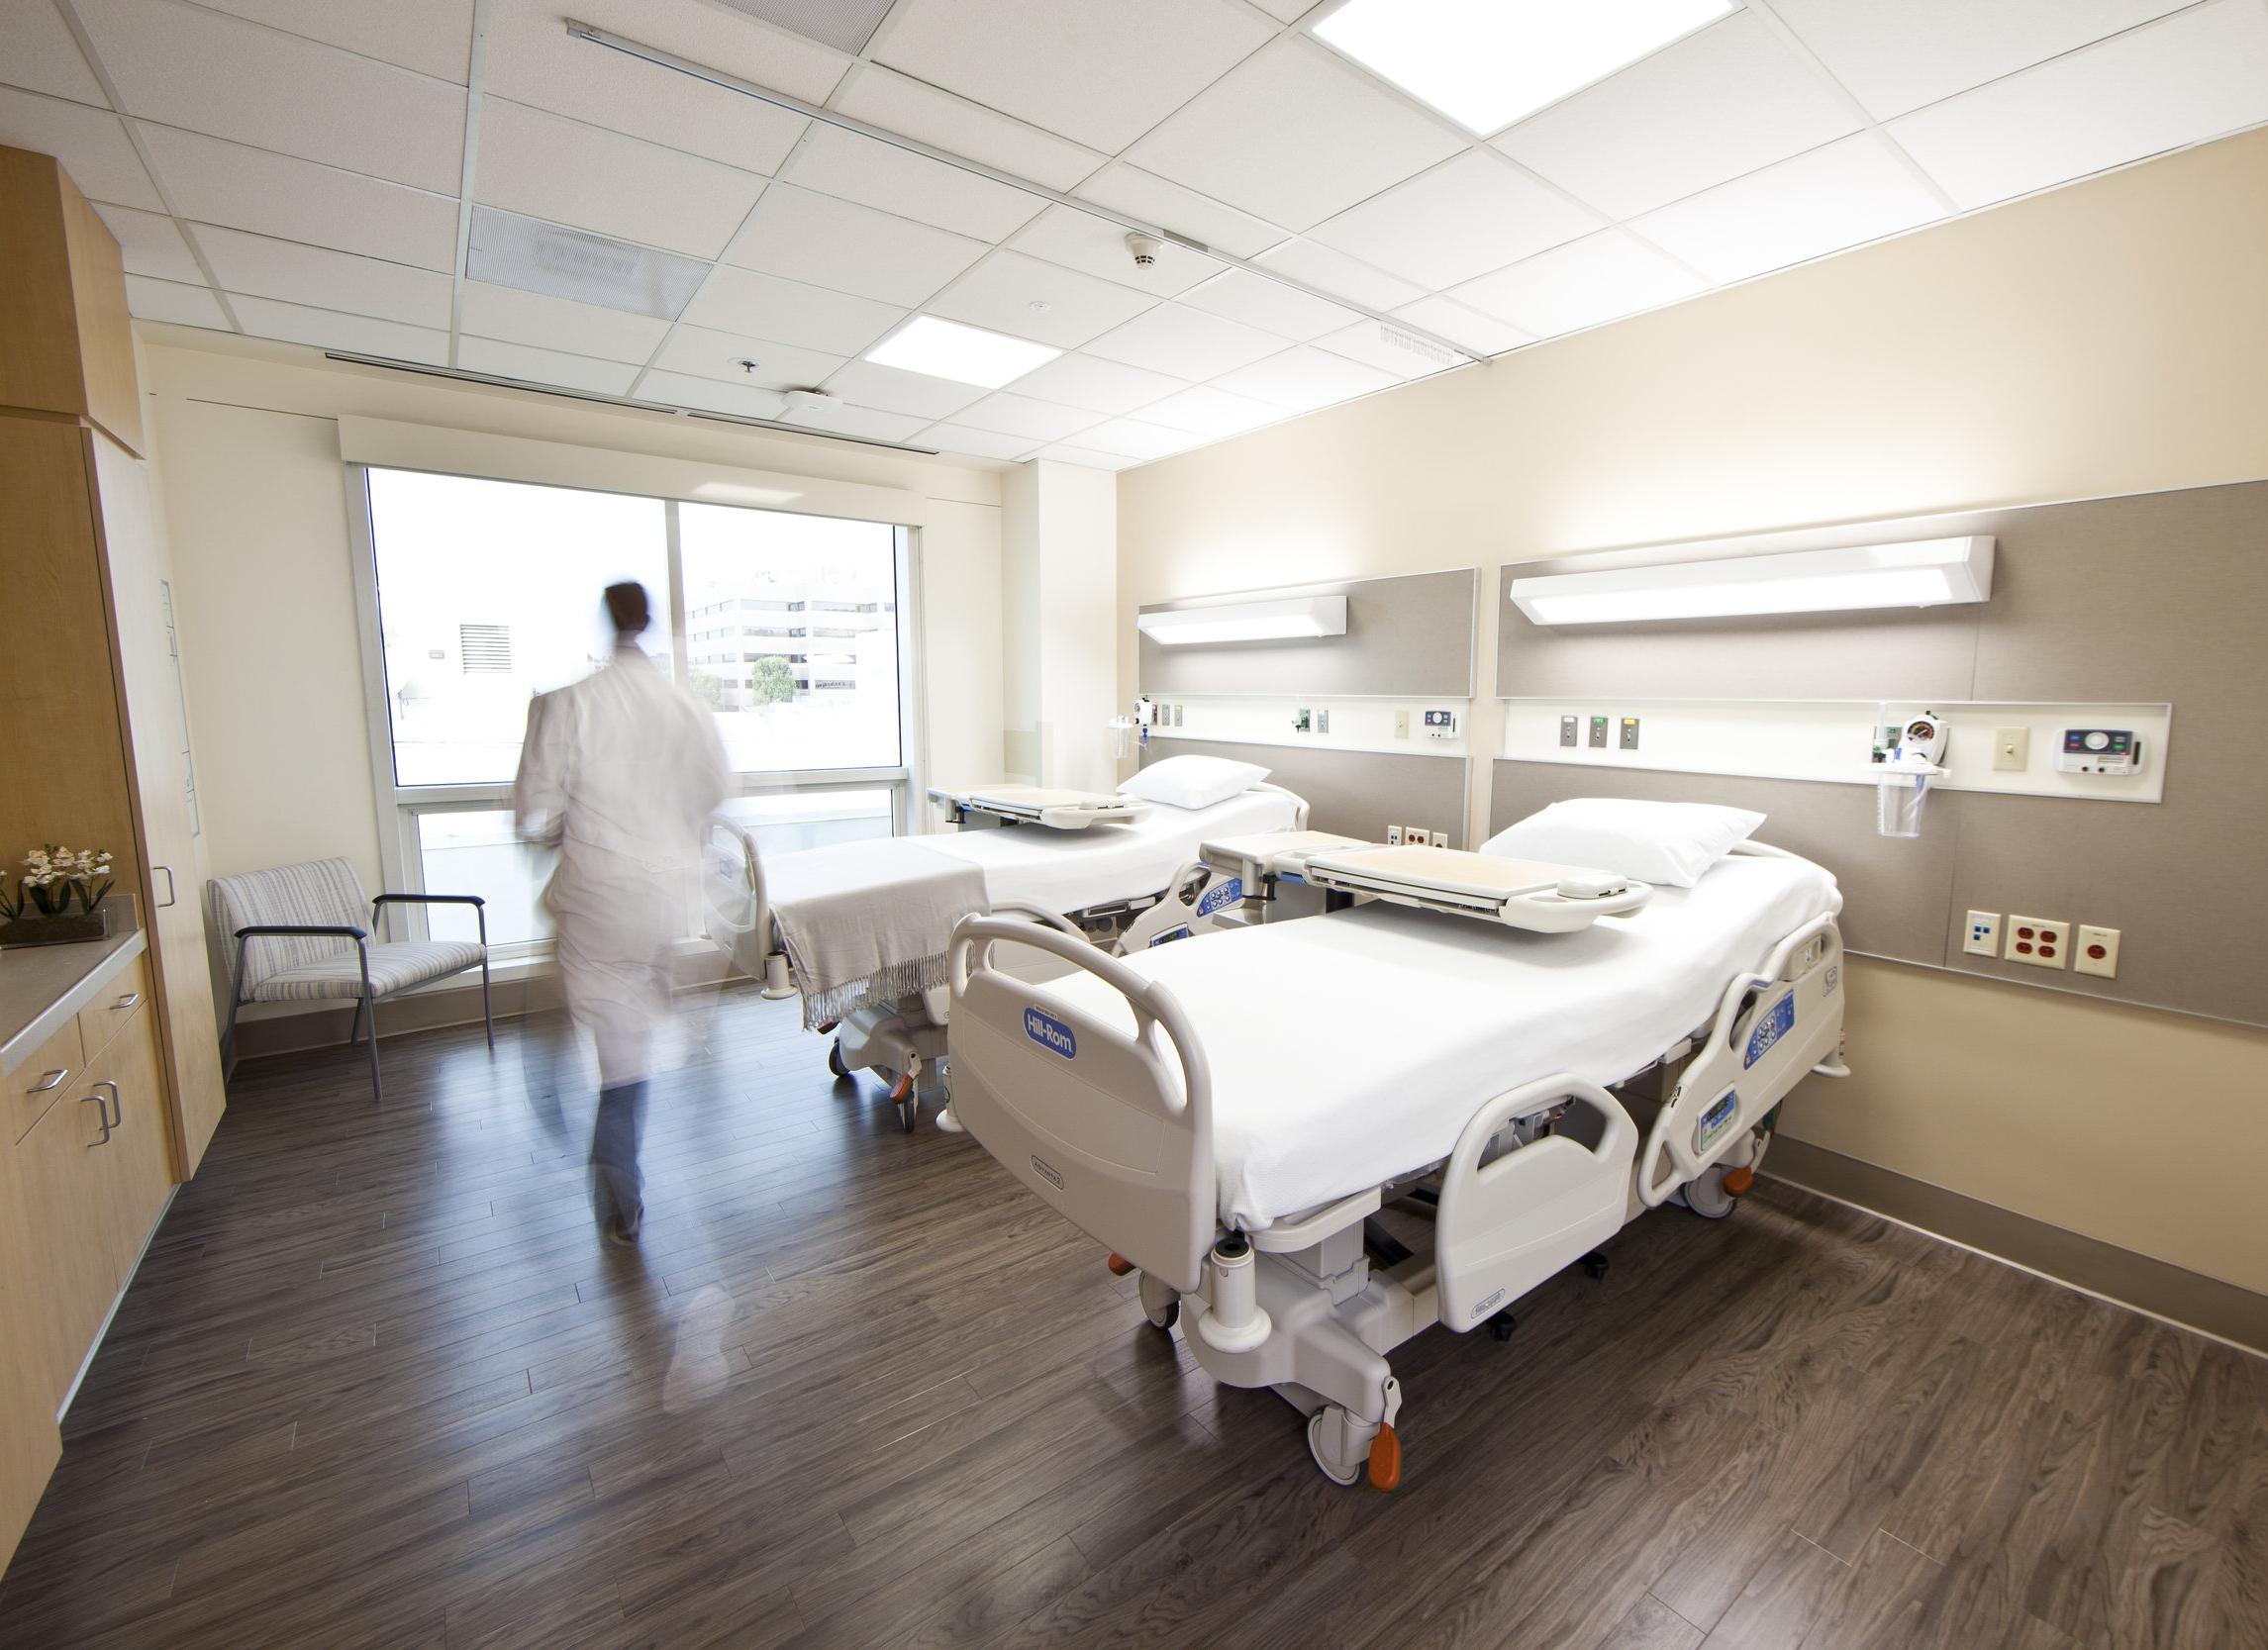 Methodist Hospital Rehabiliation Unit Patient Room